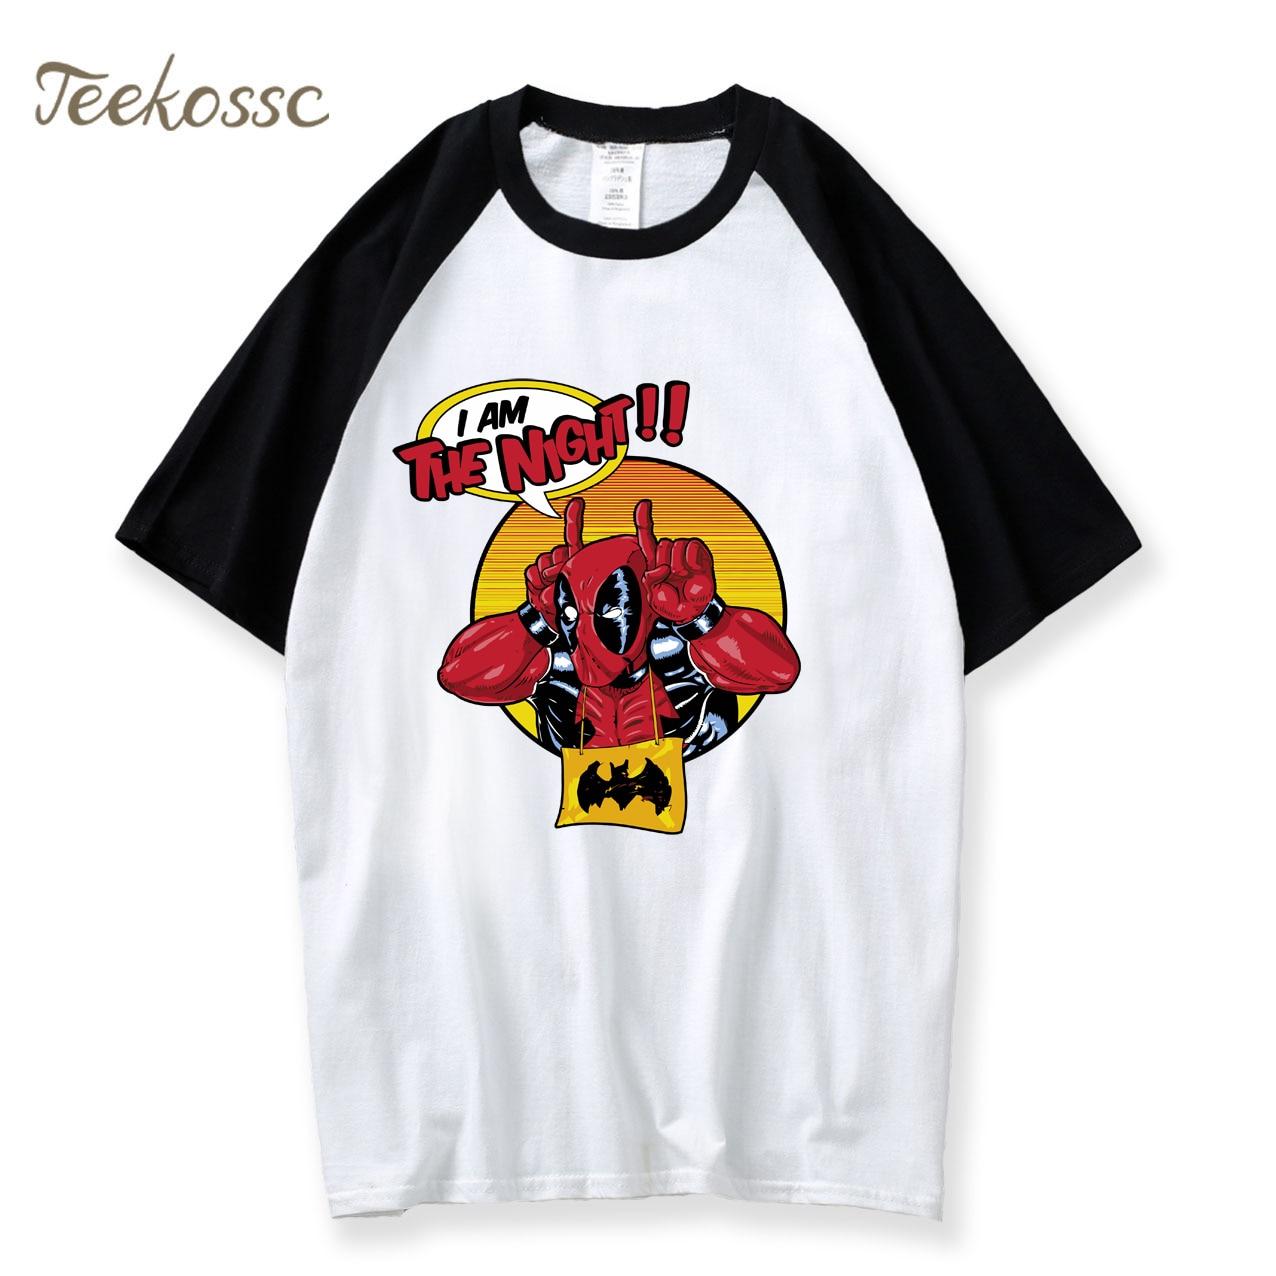 Camiseta Deadpool para hombre, camiseta divertida I Am The Night, novedad de 2020, camisetas de verano de cómic americano Badass, camiseta de piscina muerta, camiseta